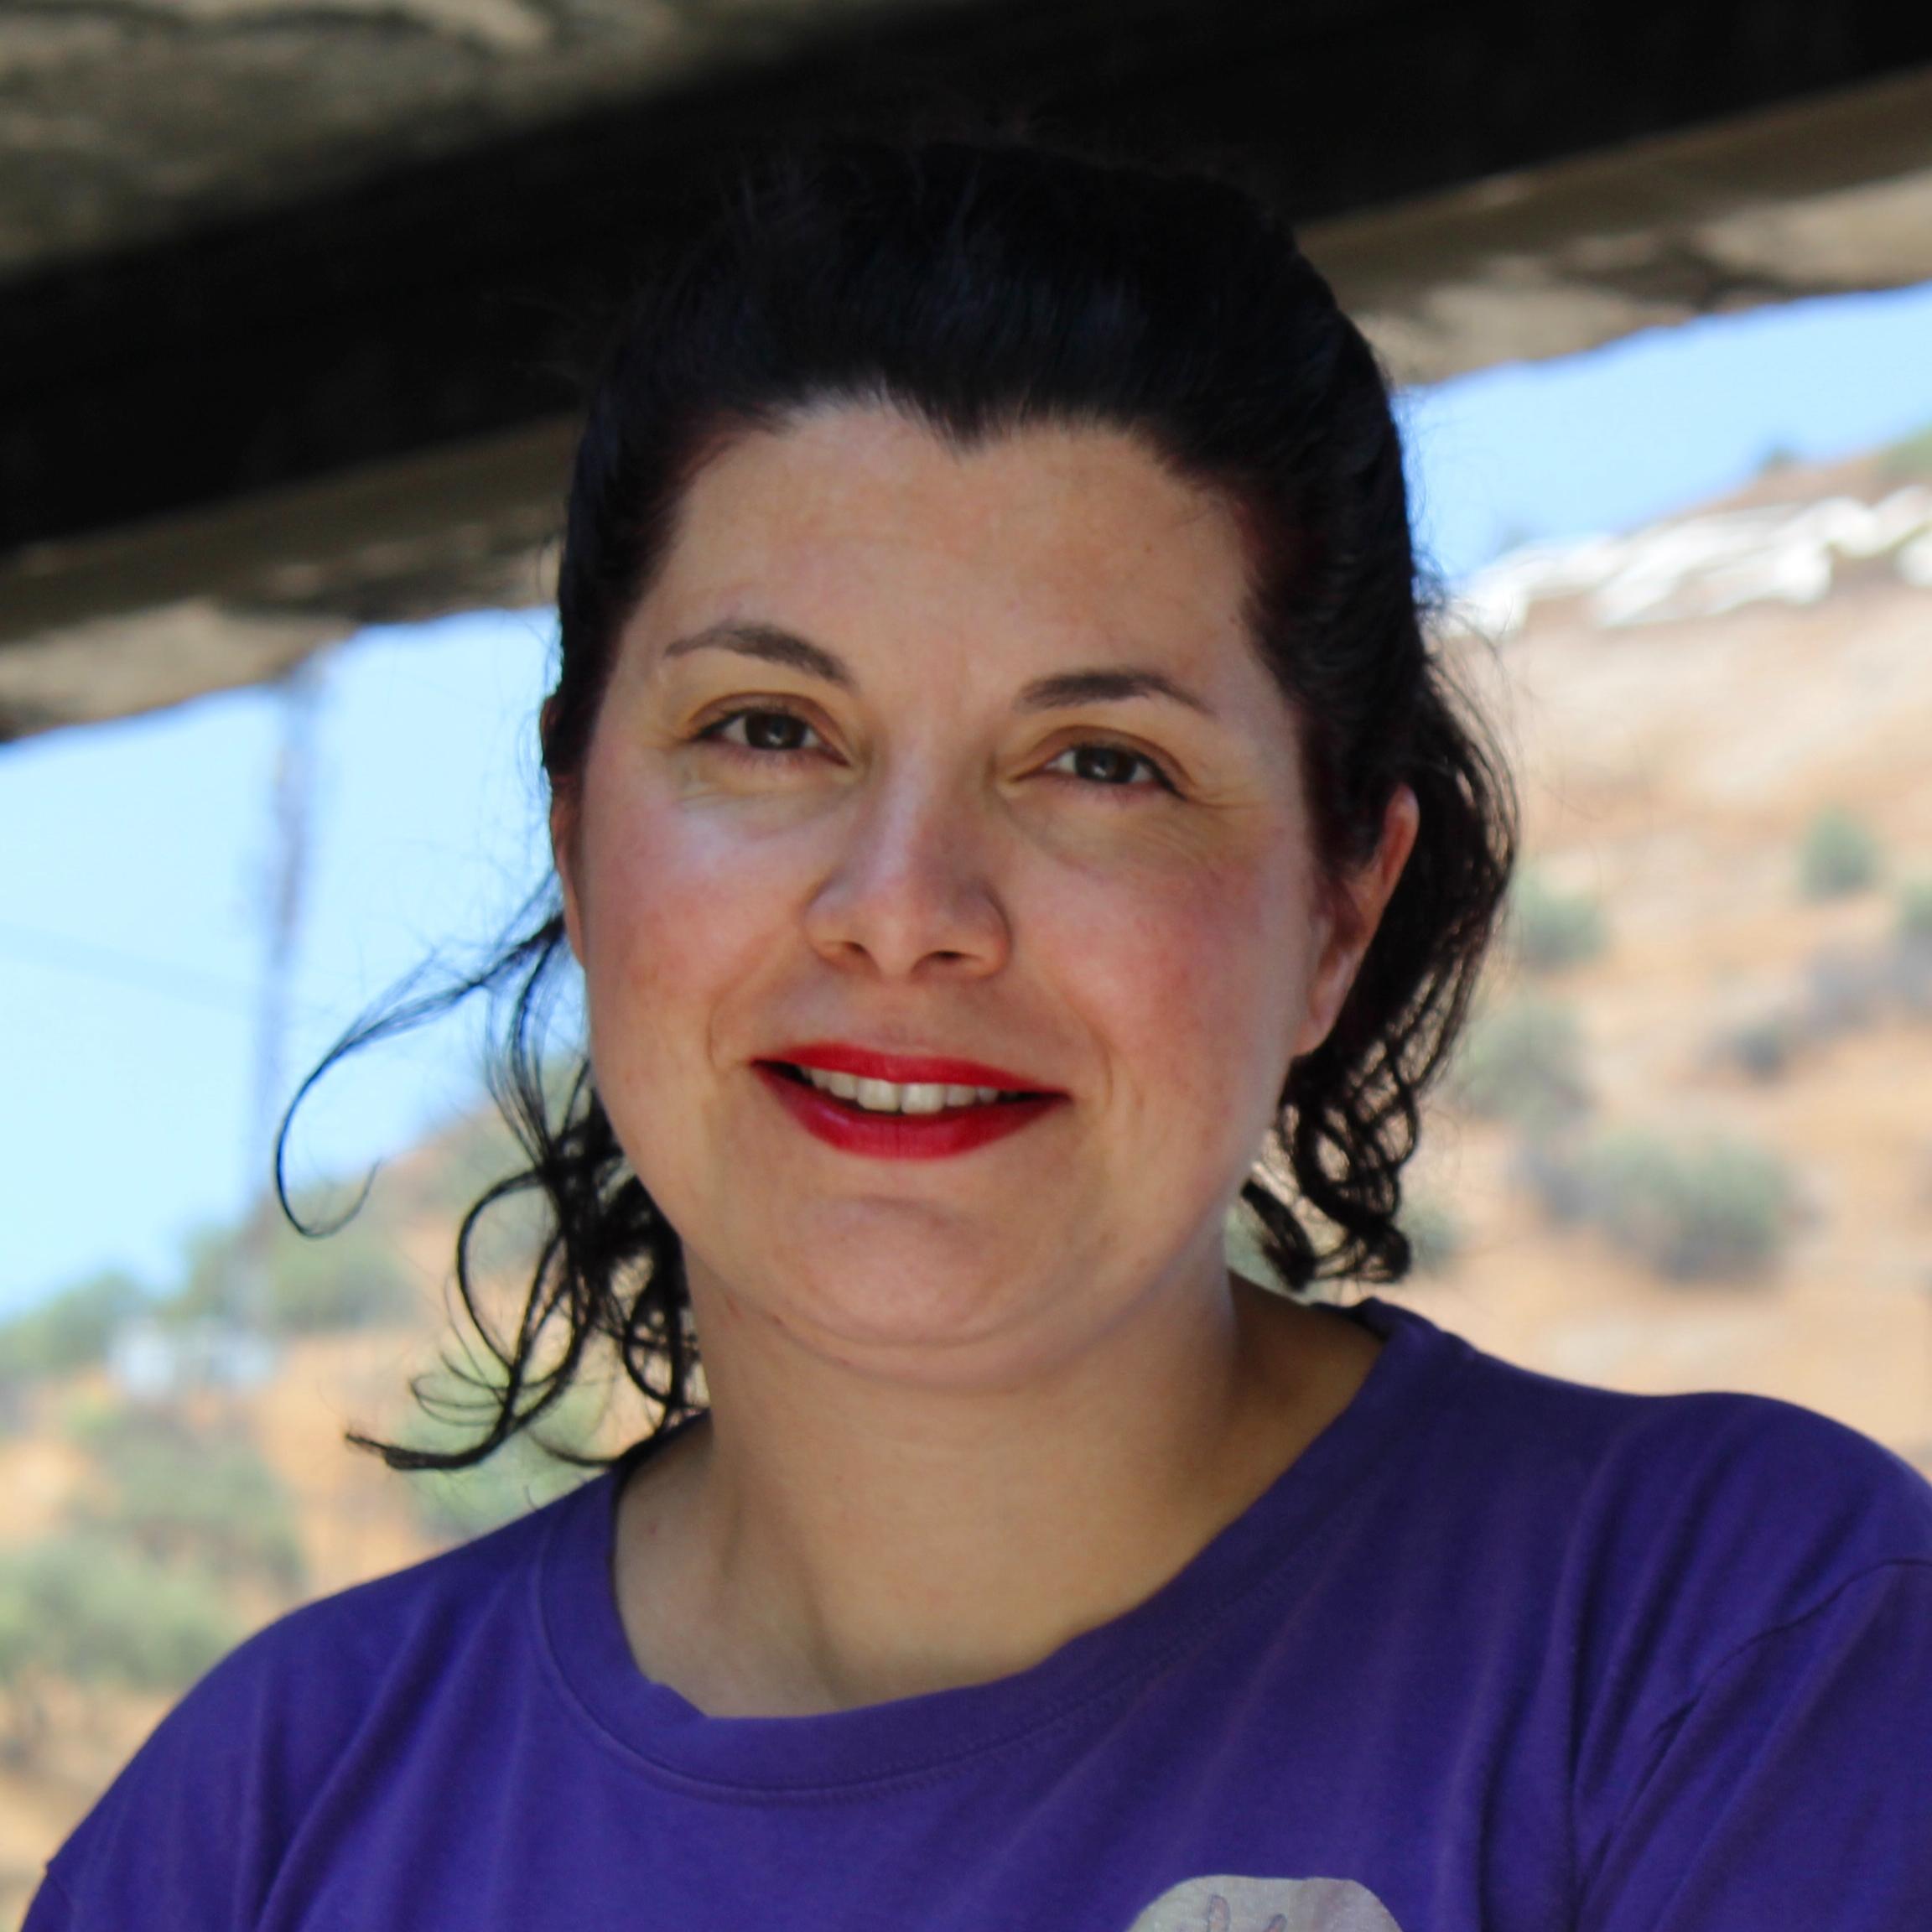 Mariela Serey a la Constituyente's Avatar